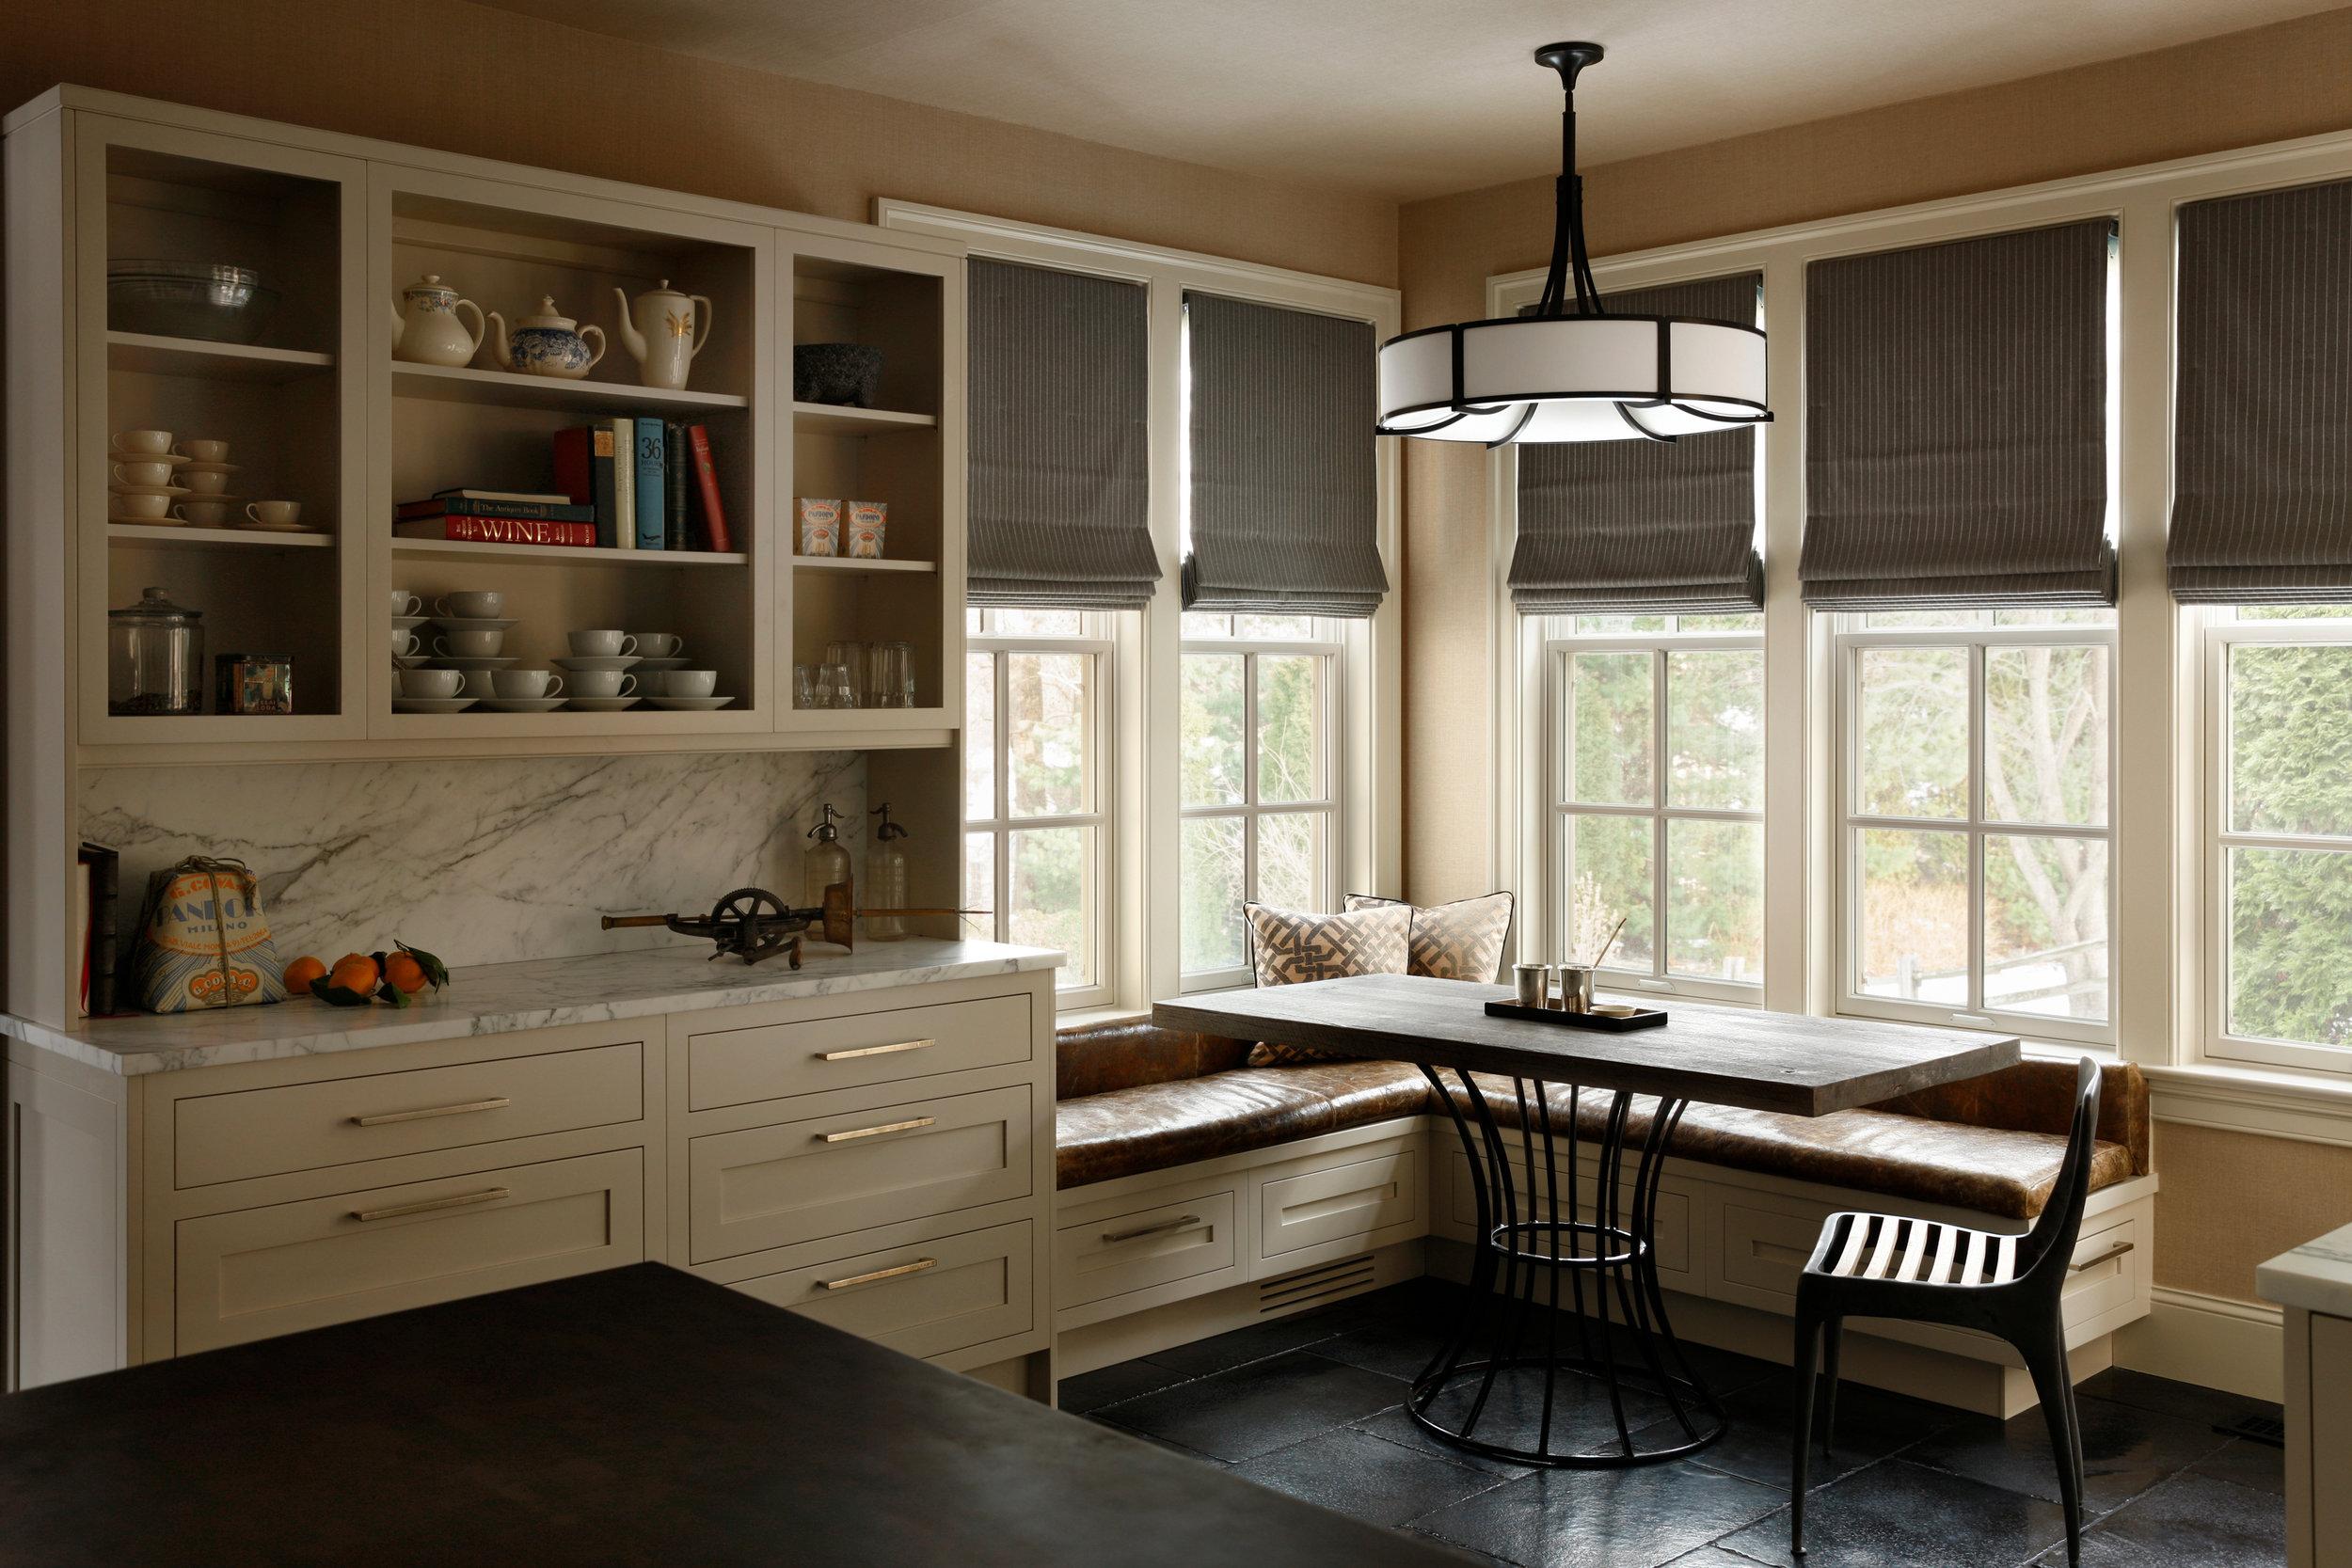 Kitchen_8058 FINAL Credit Jason Varney.jpg